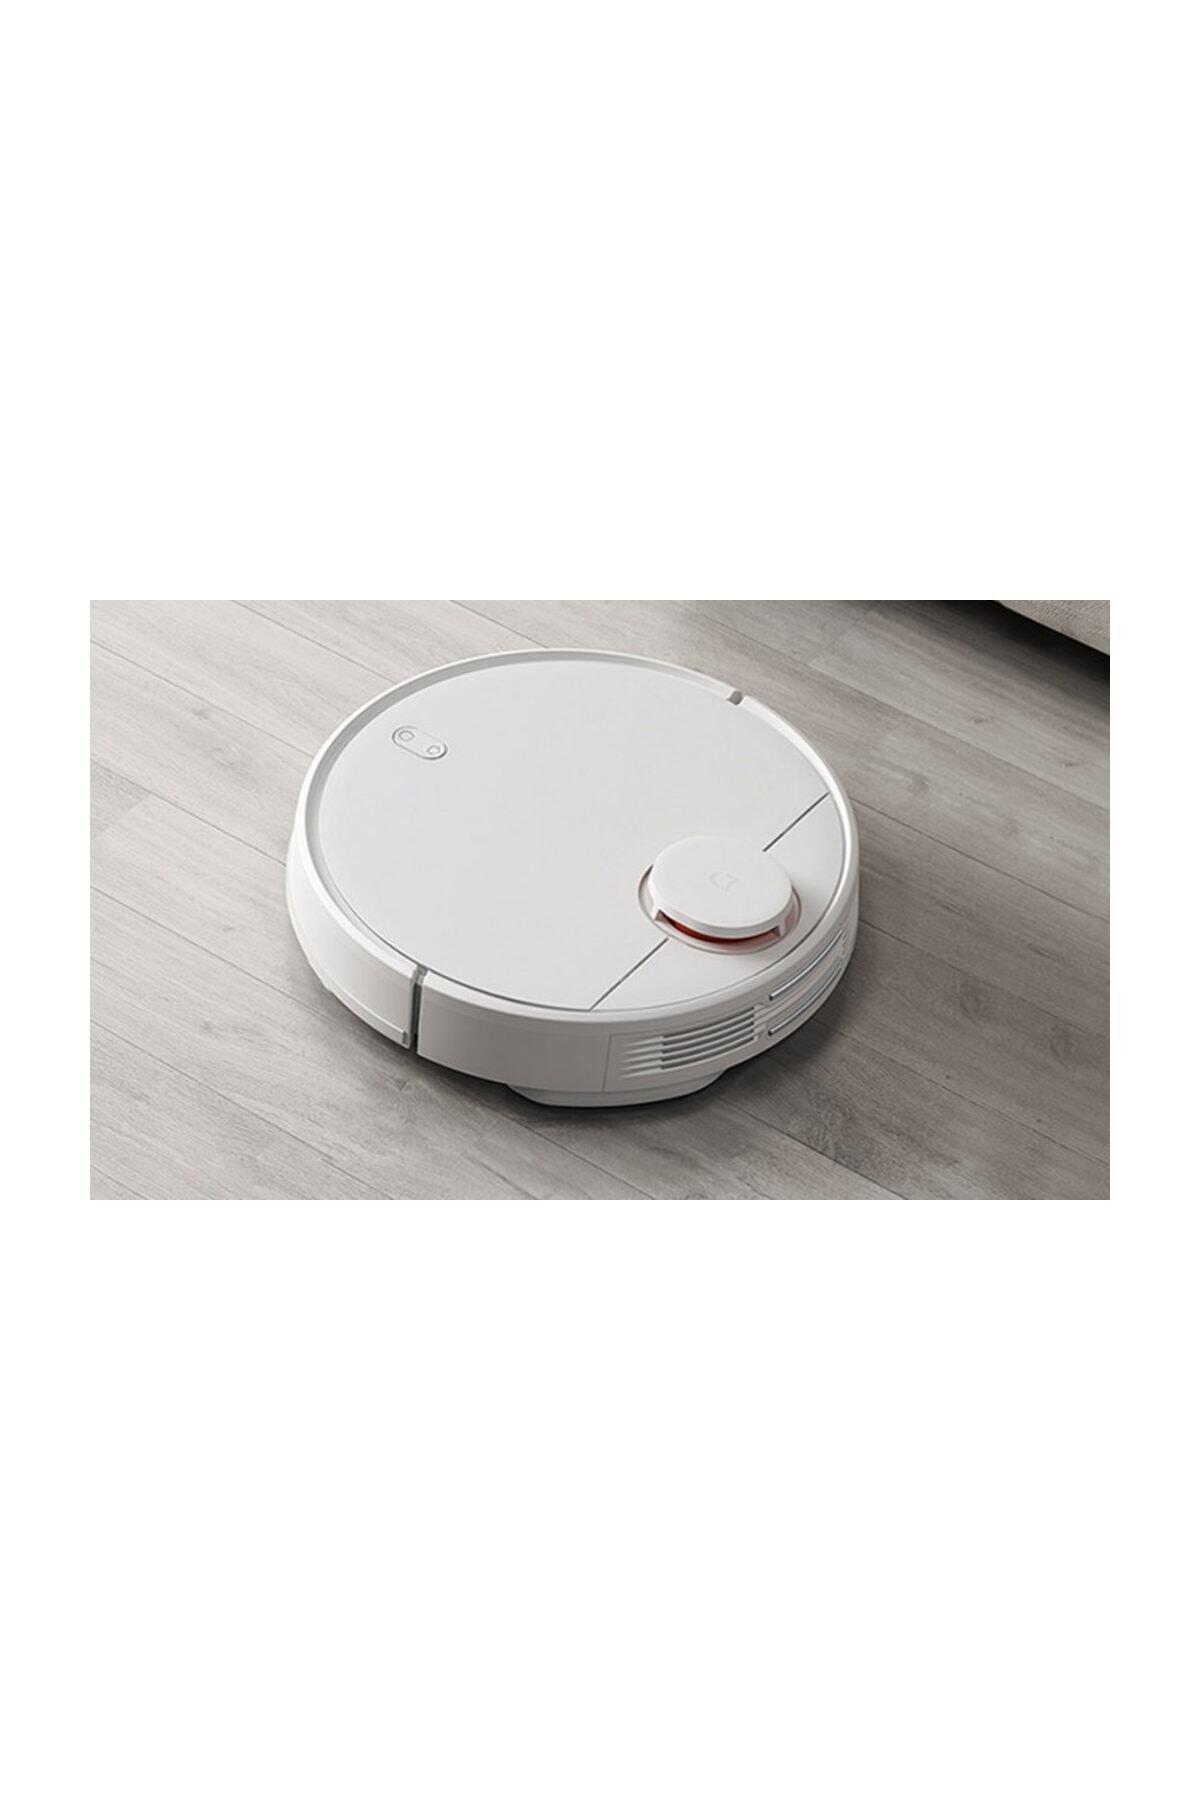 Xiaomi Mijia Robot Vacuum Mop Pro Cleaner - Robot Süpürge Ve Paspas- Beyaz 2